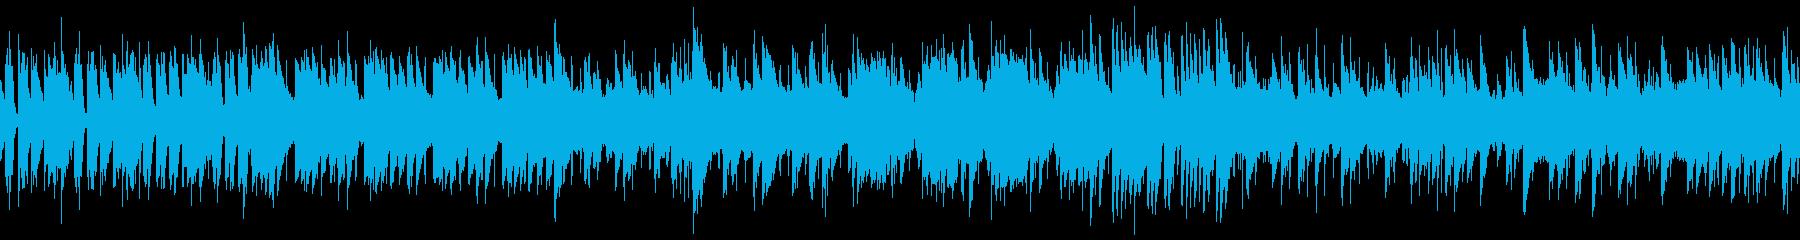 8bit ポップでスペースチックなループの再生済みの波形